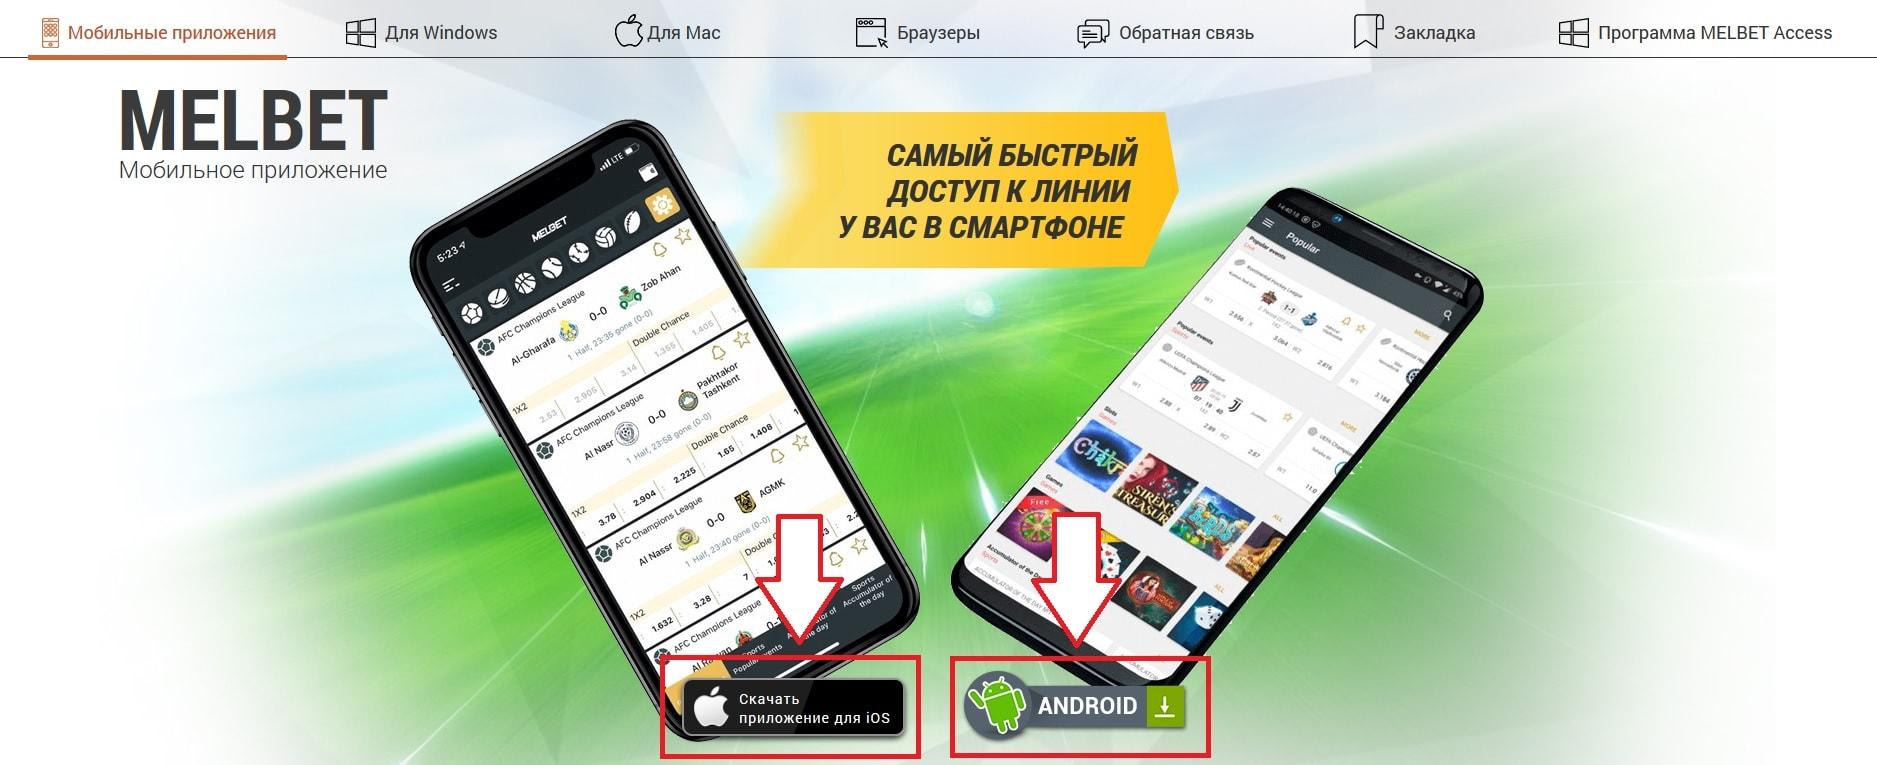 Кнопки для скачивания приложения Мелбет на Андроид и Айфон